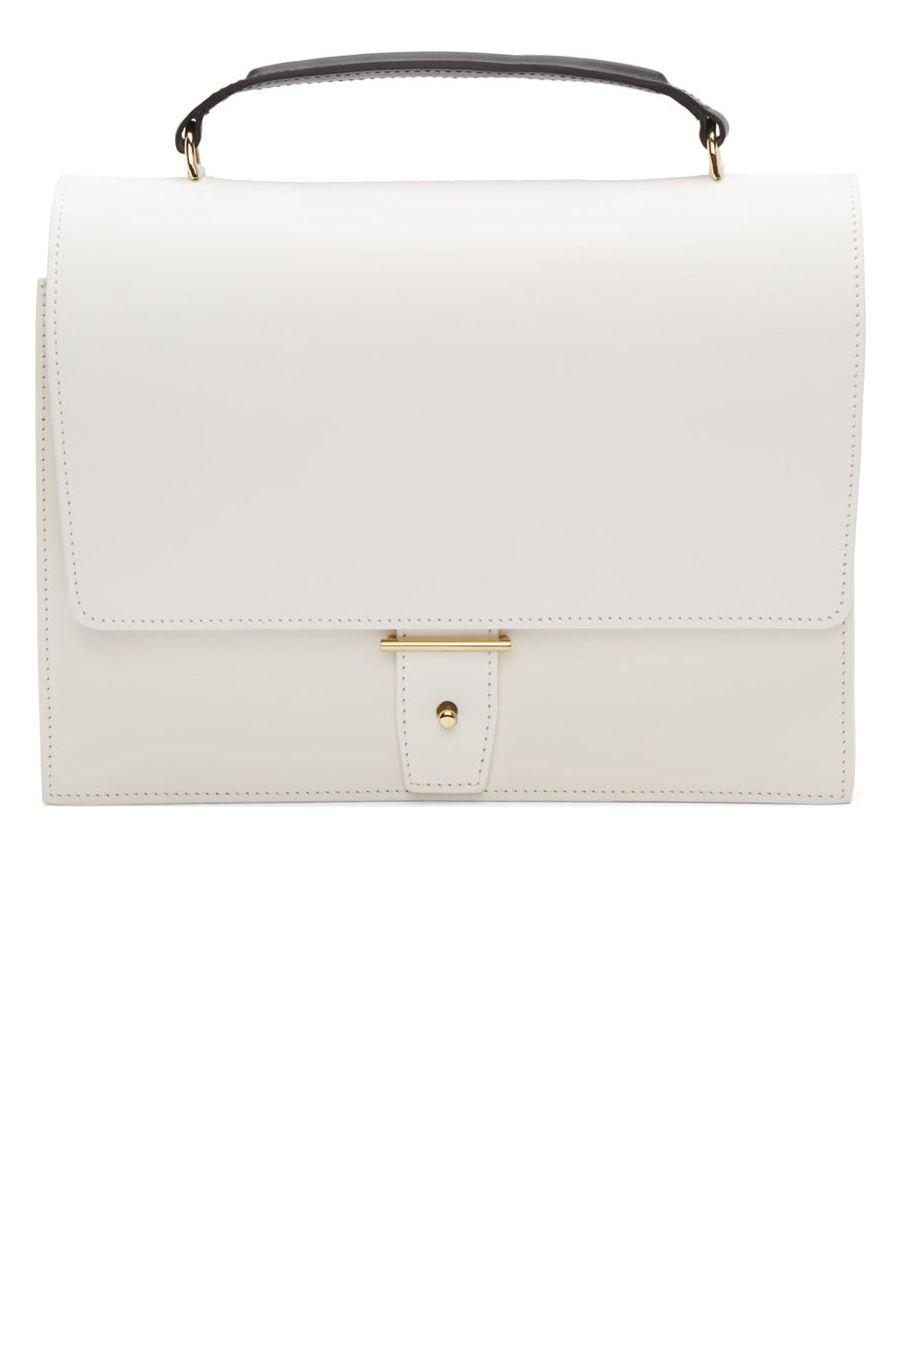 "<p><strong>PB 0110</strong> bag, $878, <a href=""http://shop.pb0110.de/en/women/ab3-handbag-white-leather.html"" target=""_blank"">pb0110.de</a>. </p>"